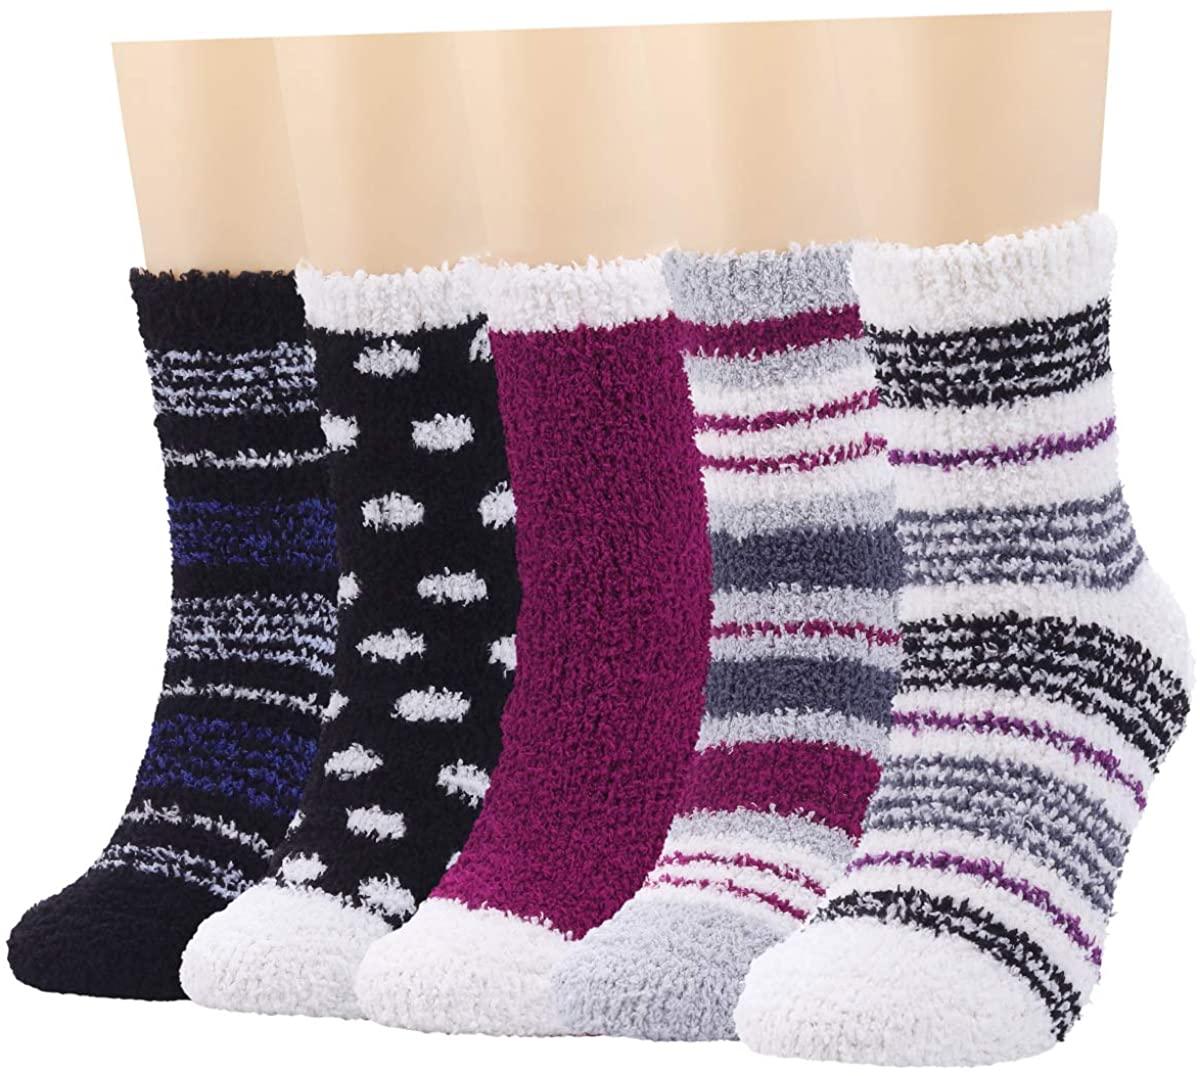 Fuzzy Socks for Women Fluffy Cozy Warm Soft Plush Slipper Socks for Sleeping Girls Comfy Holiday Socks Winter